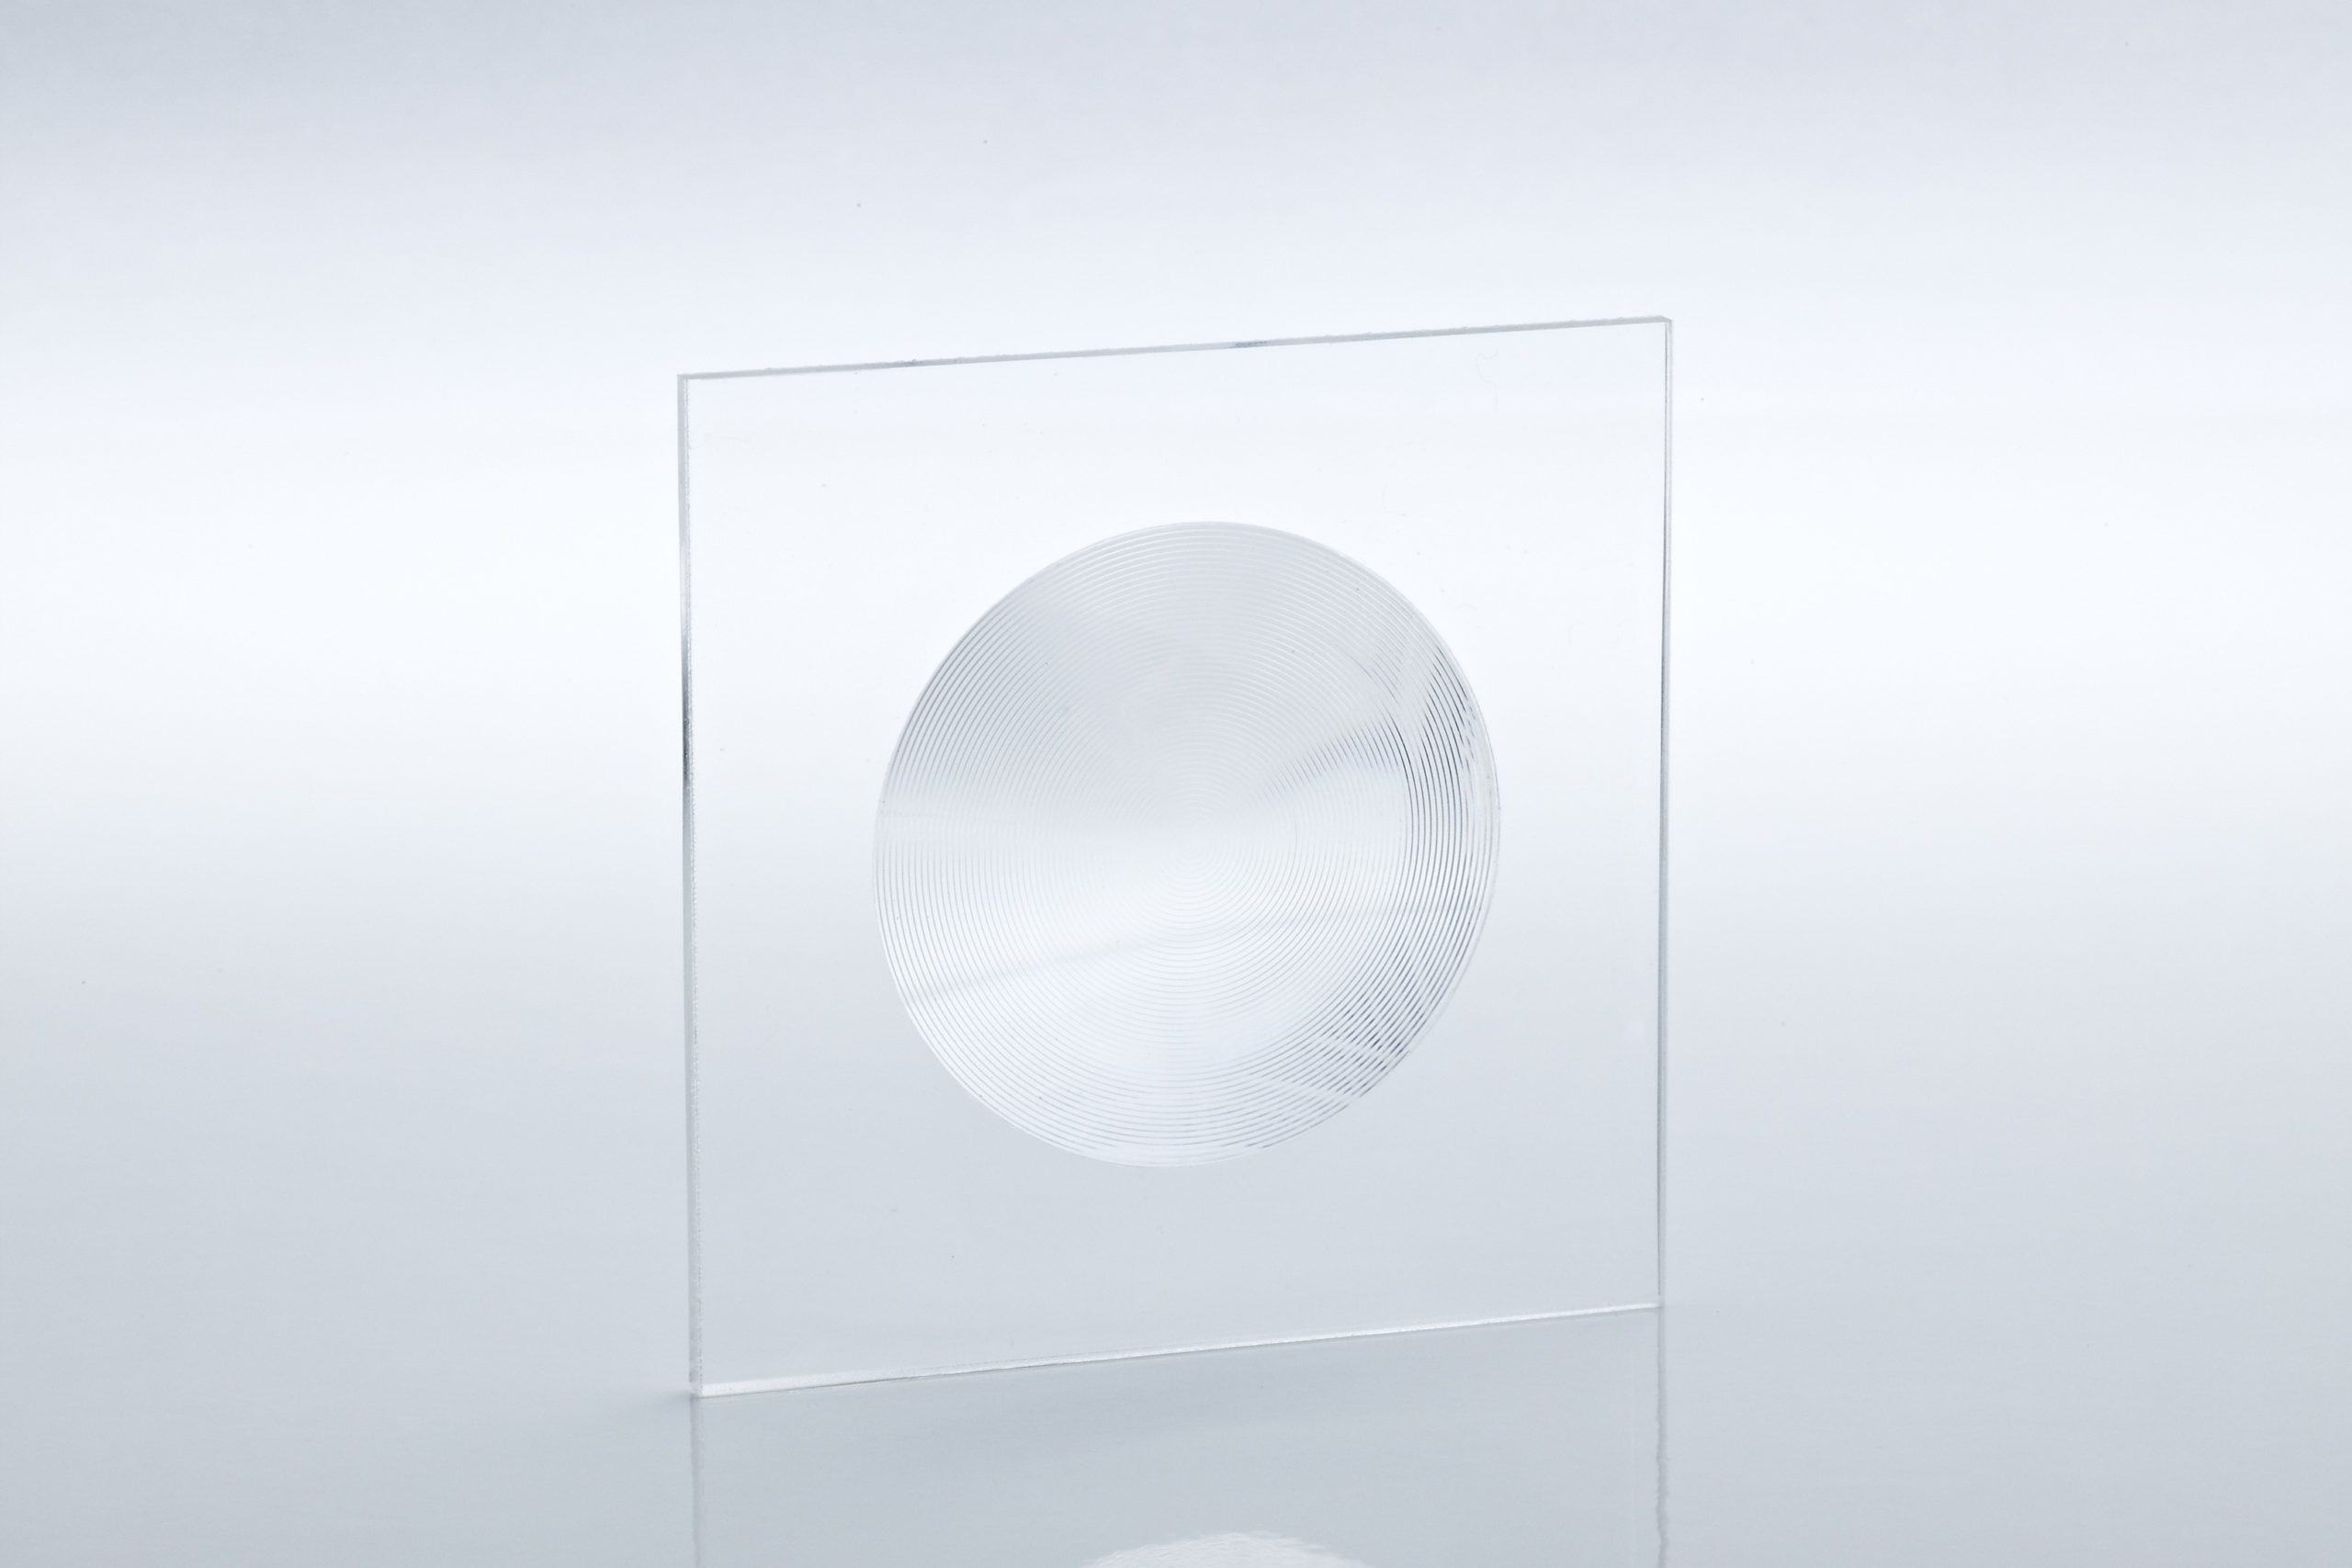 Fresnel lenses for the energy, utilities & renewable industries